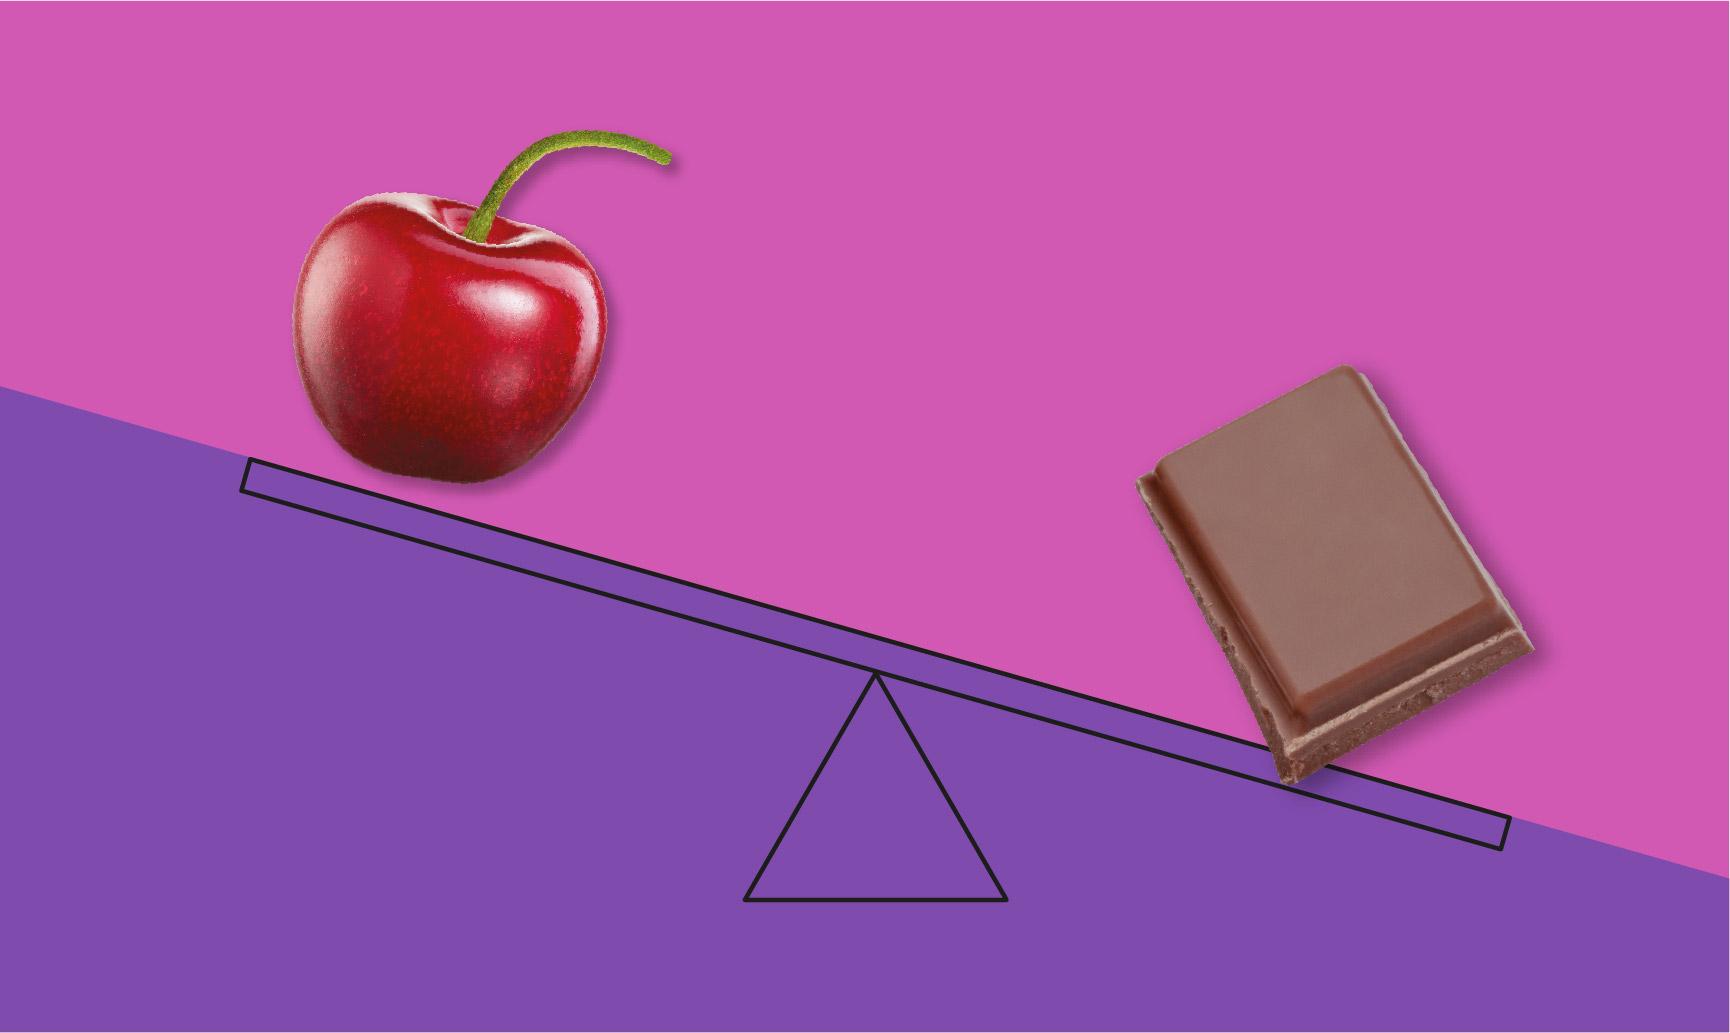 balancing cherry and chocolate illustration